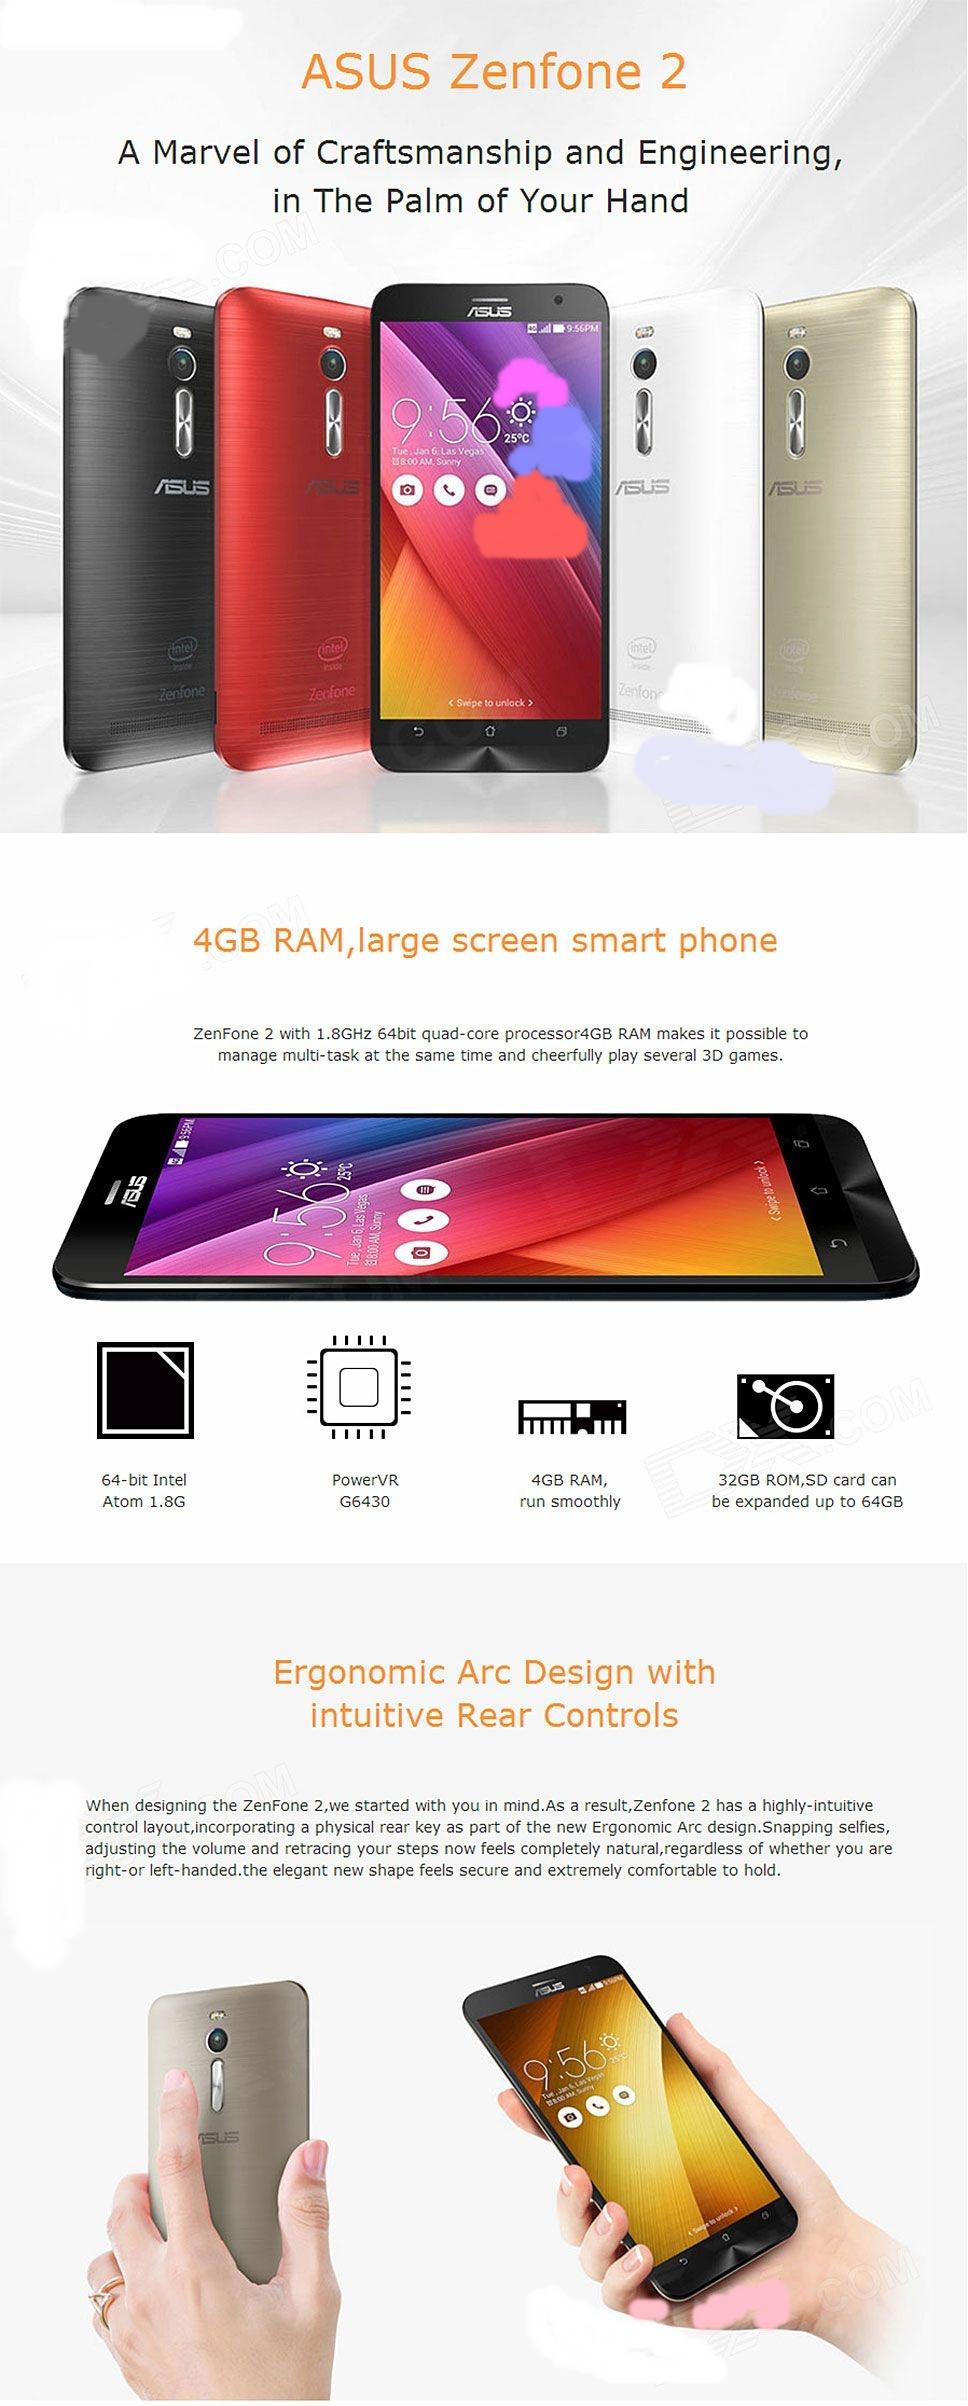 i.ibb.co/41CM4j8/Smartphone-Android-5-0-4-GB-RAM-32-GB-ROM-Quad-Core-4-G-ASUS-Zenfone-2-ZE551-ML.jpg